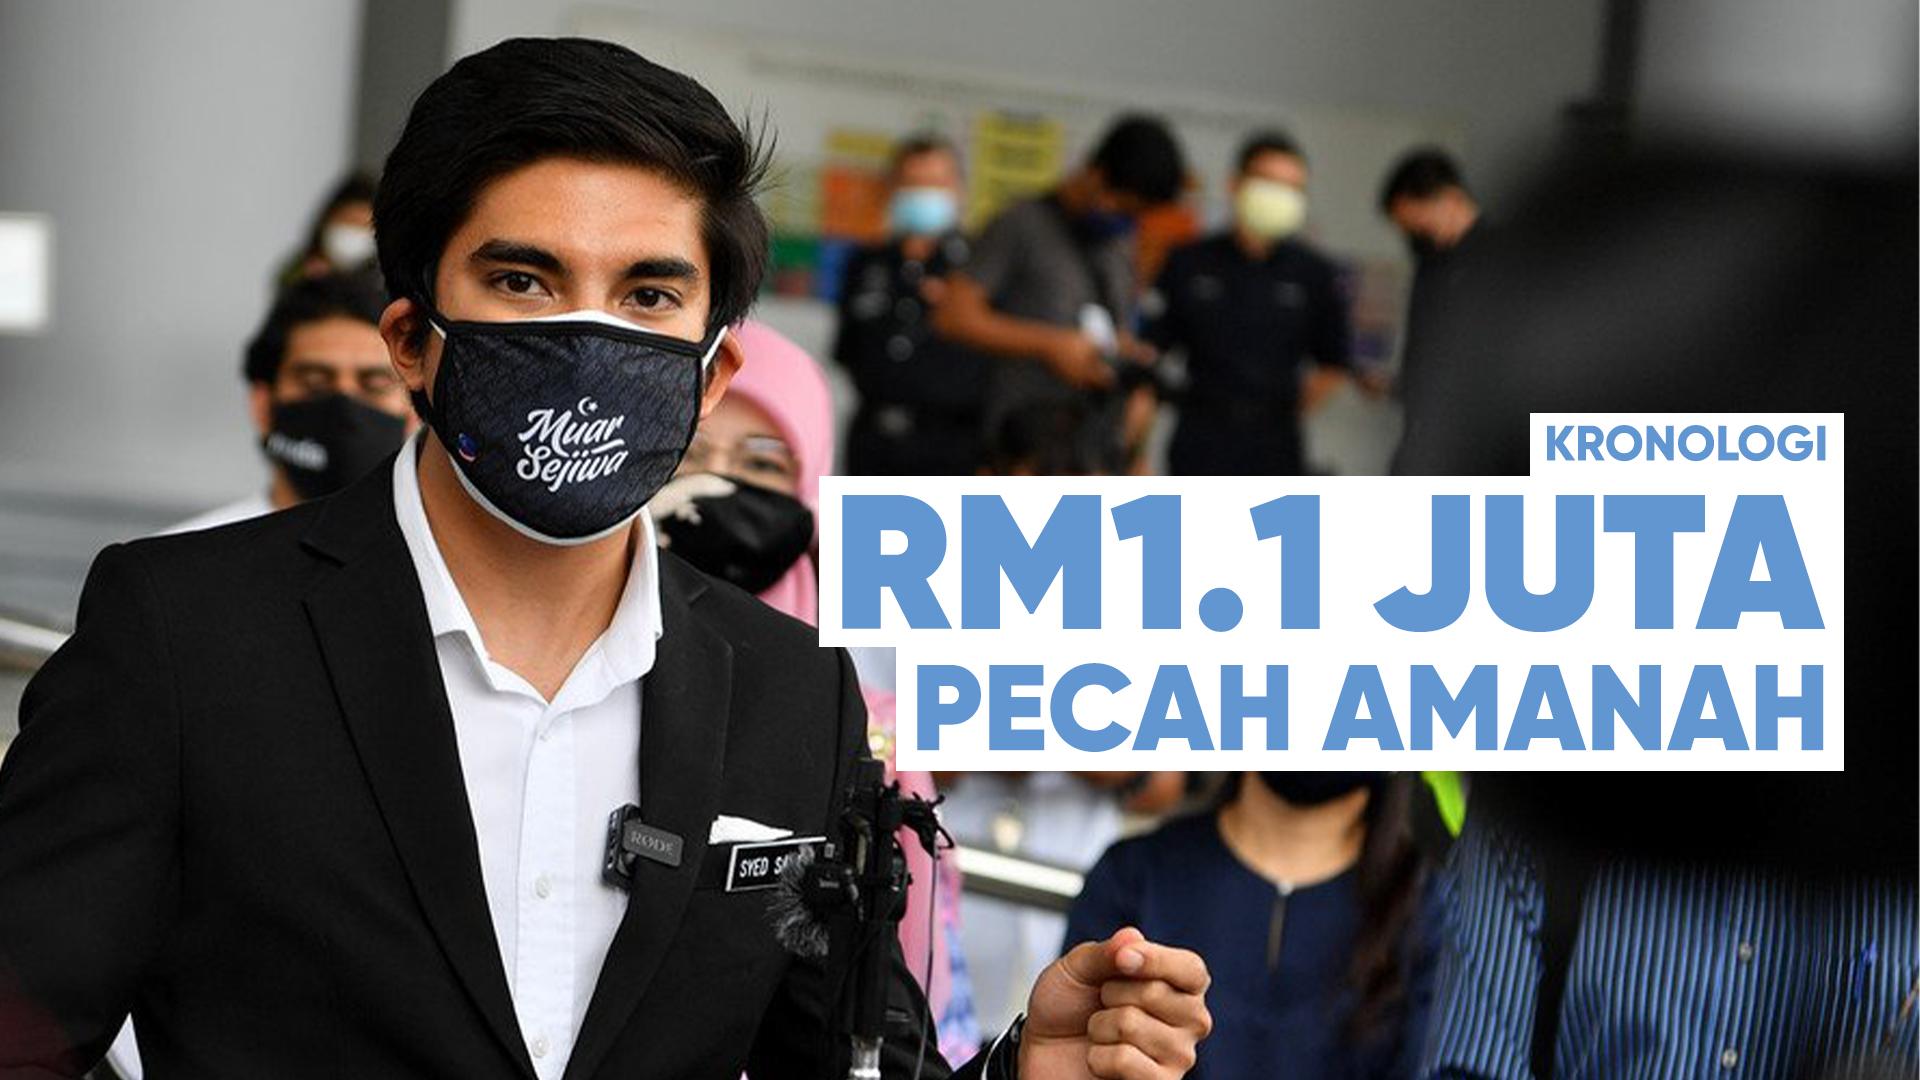 Ringkasan Kes RM1.1 Juta Syed Saddiq Pecah Amanah